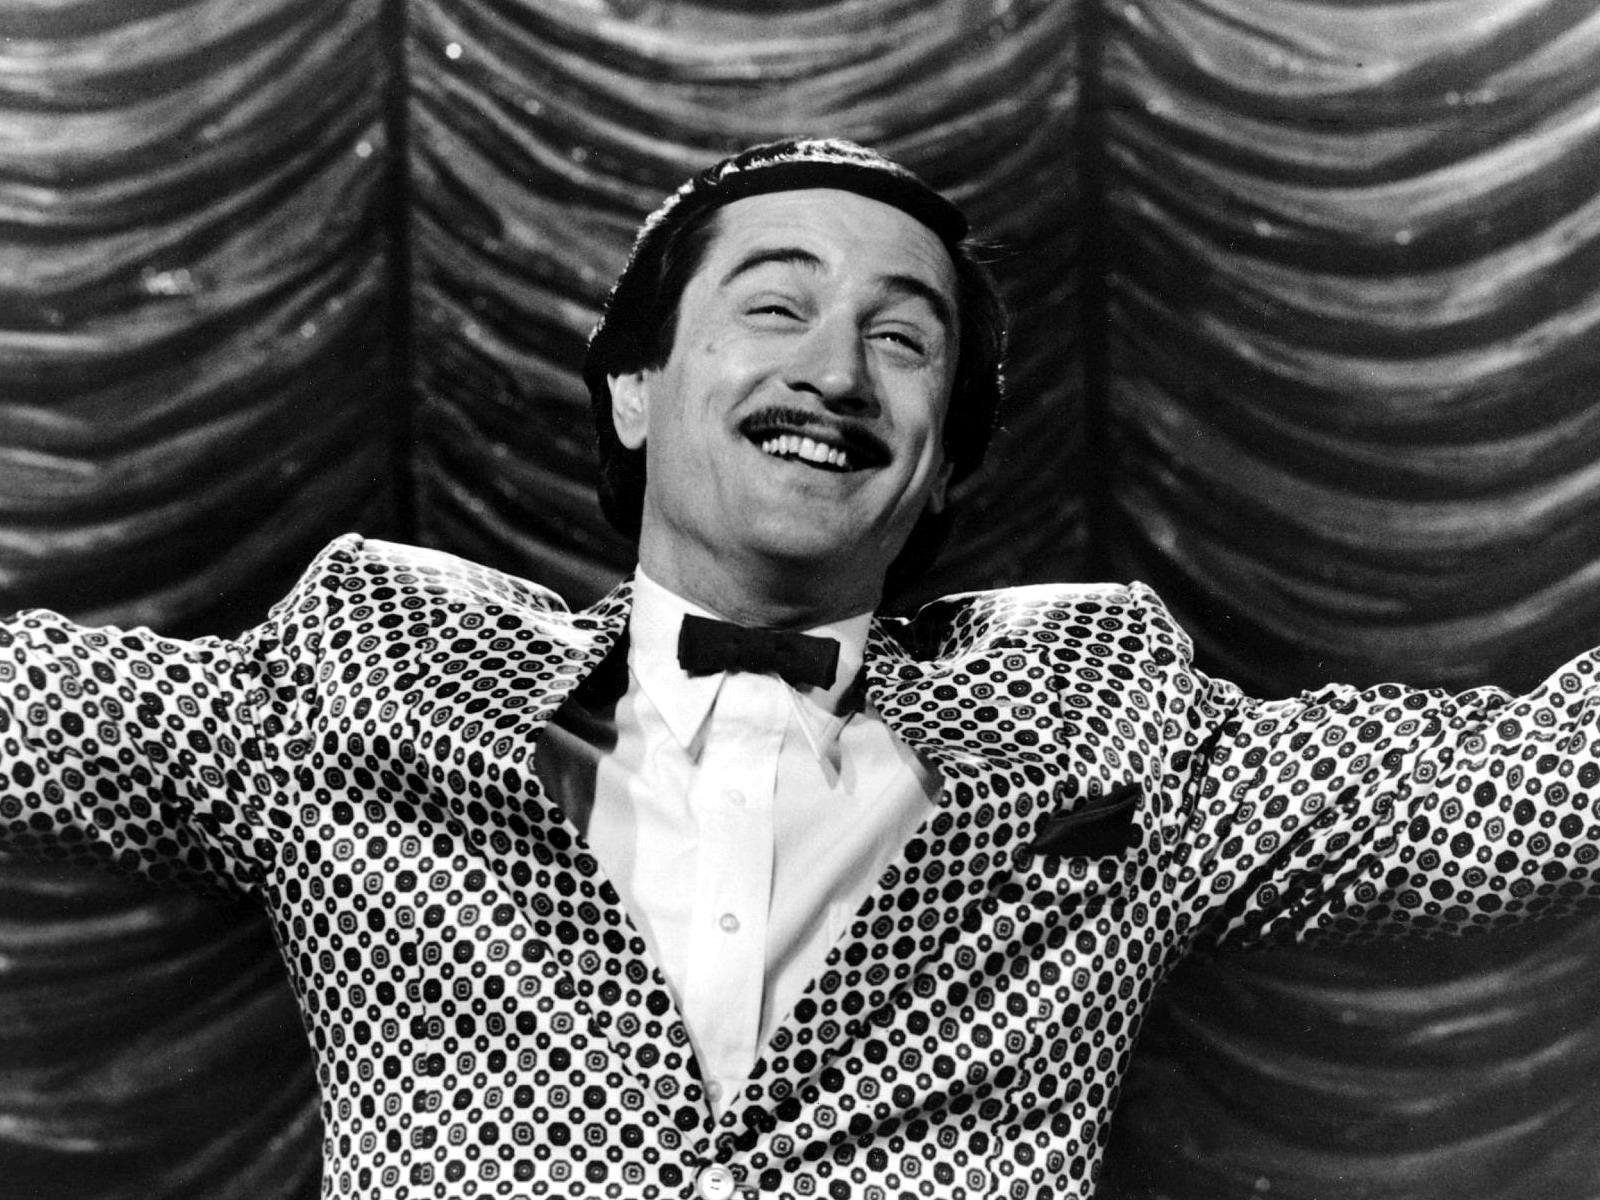 Robert de Niro King-of-comedy_1600x1200_www-gdefon-ru